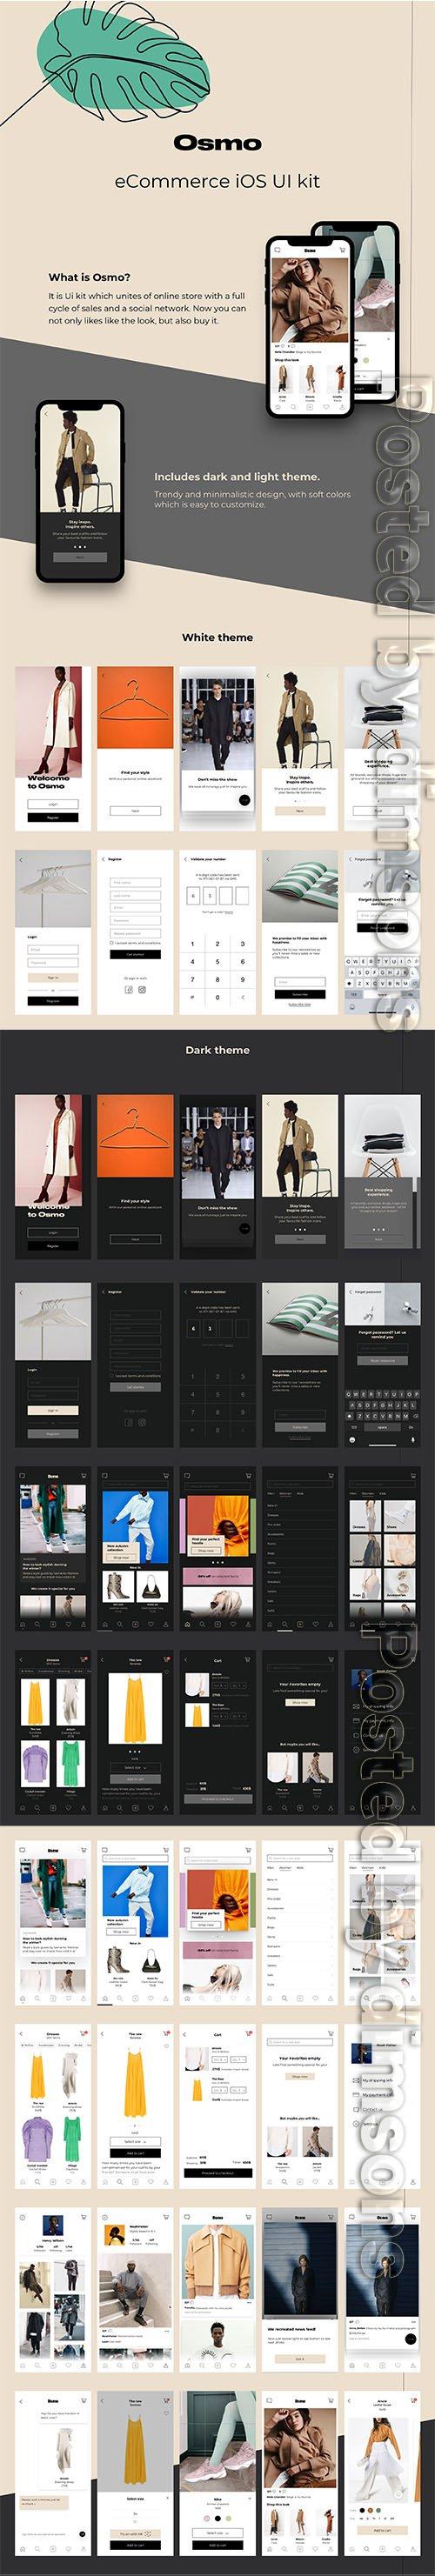 Osmo e-Commerce Ui kit - UI8